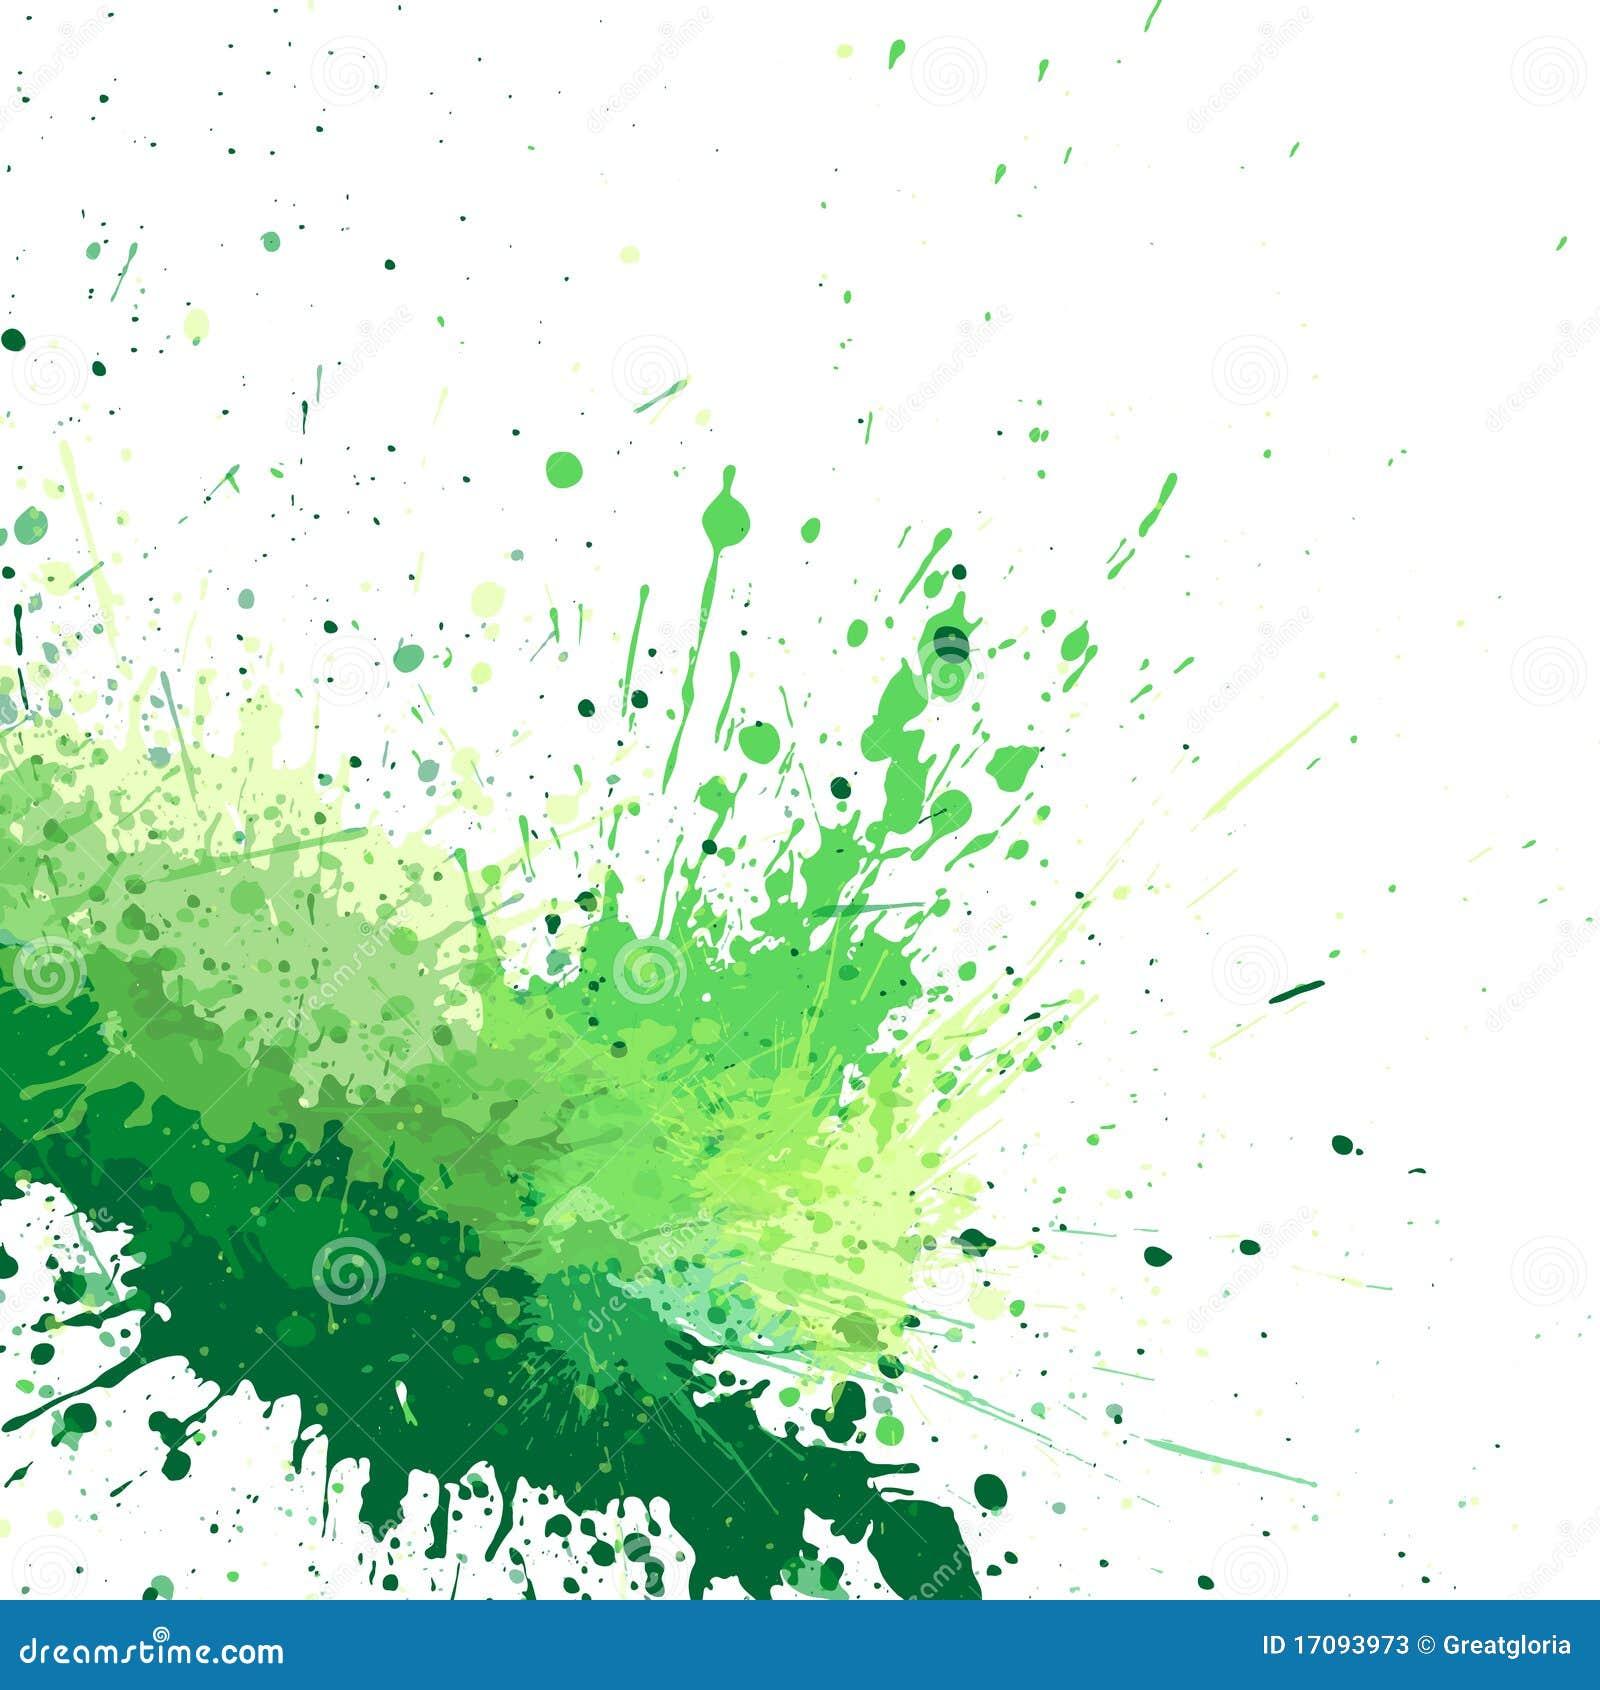 Abstracte grungeachtergrond, vector